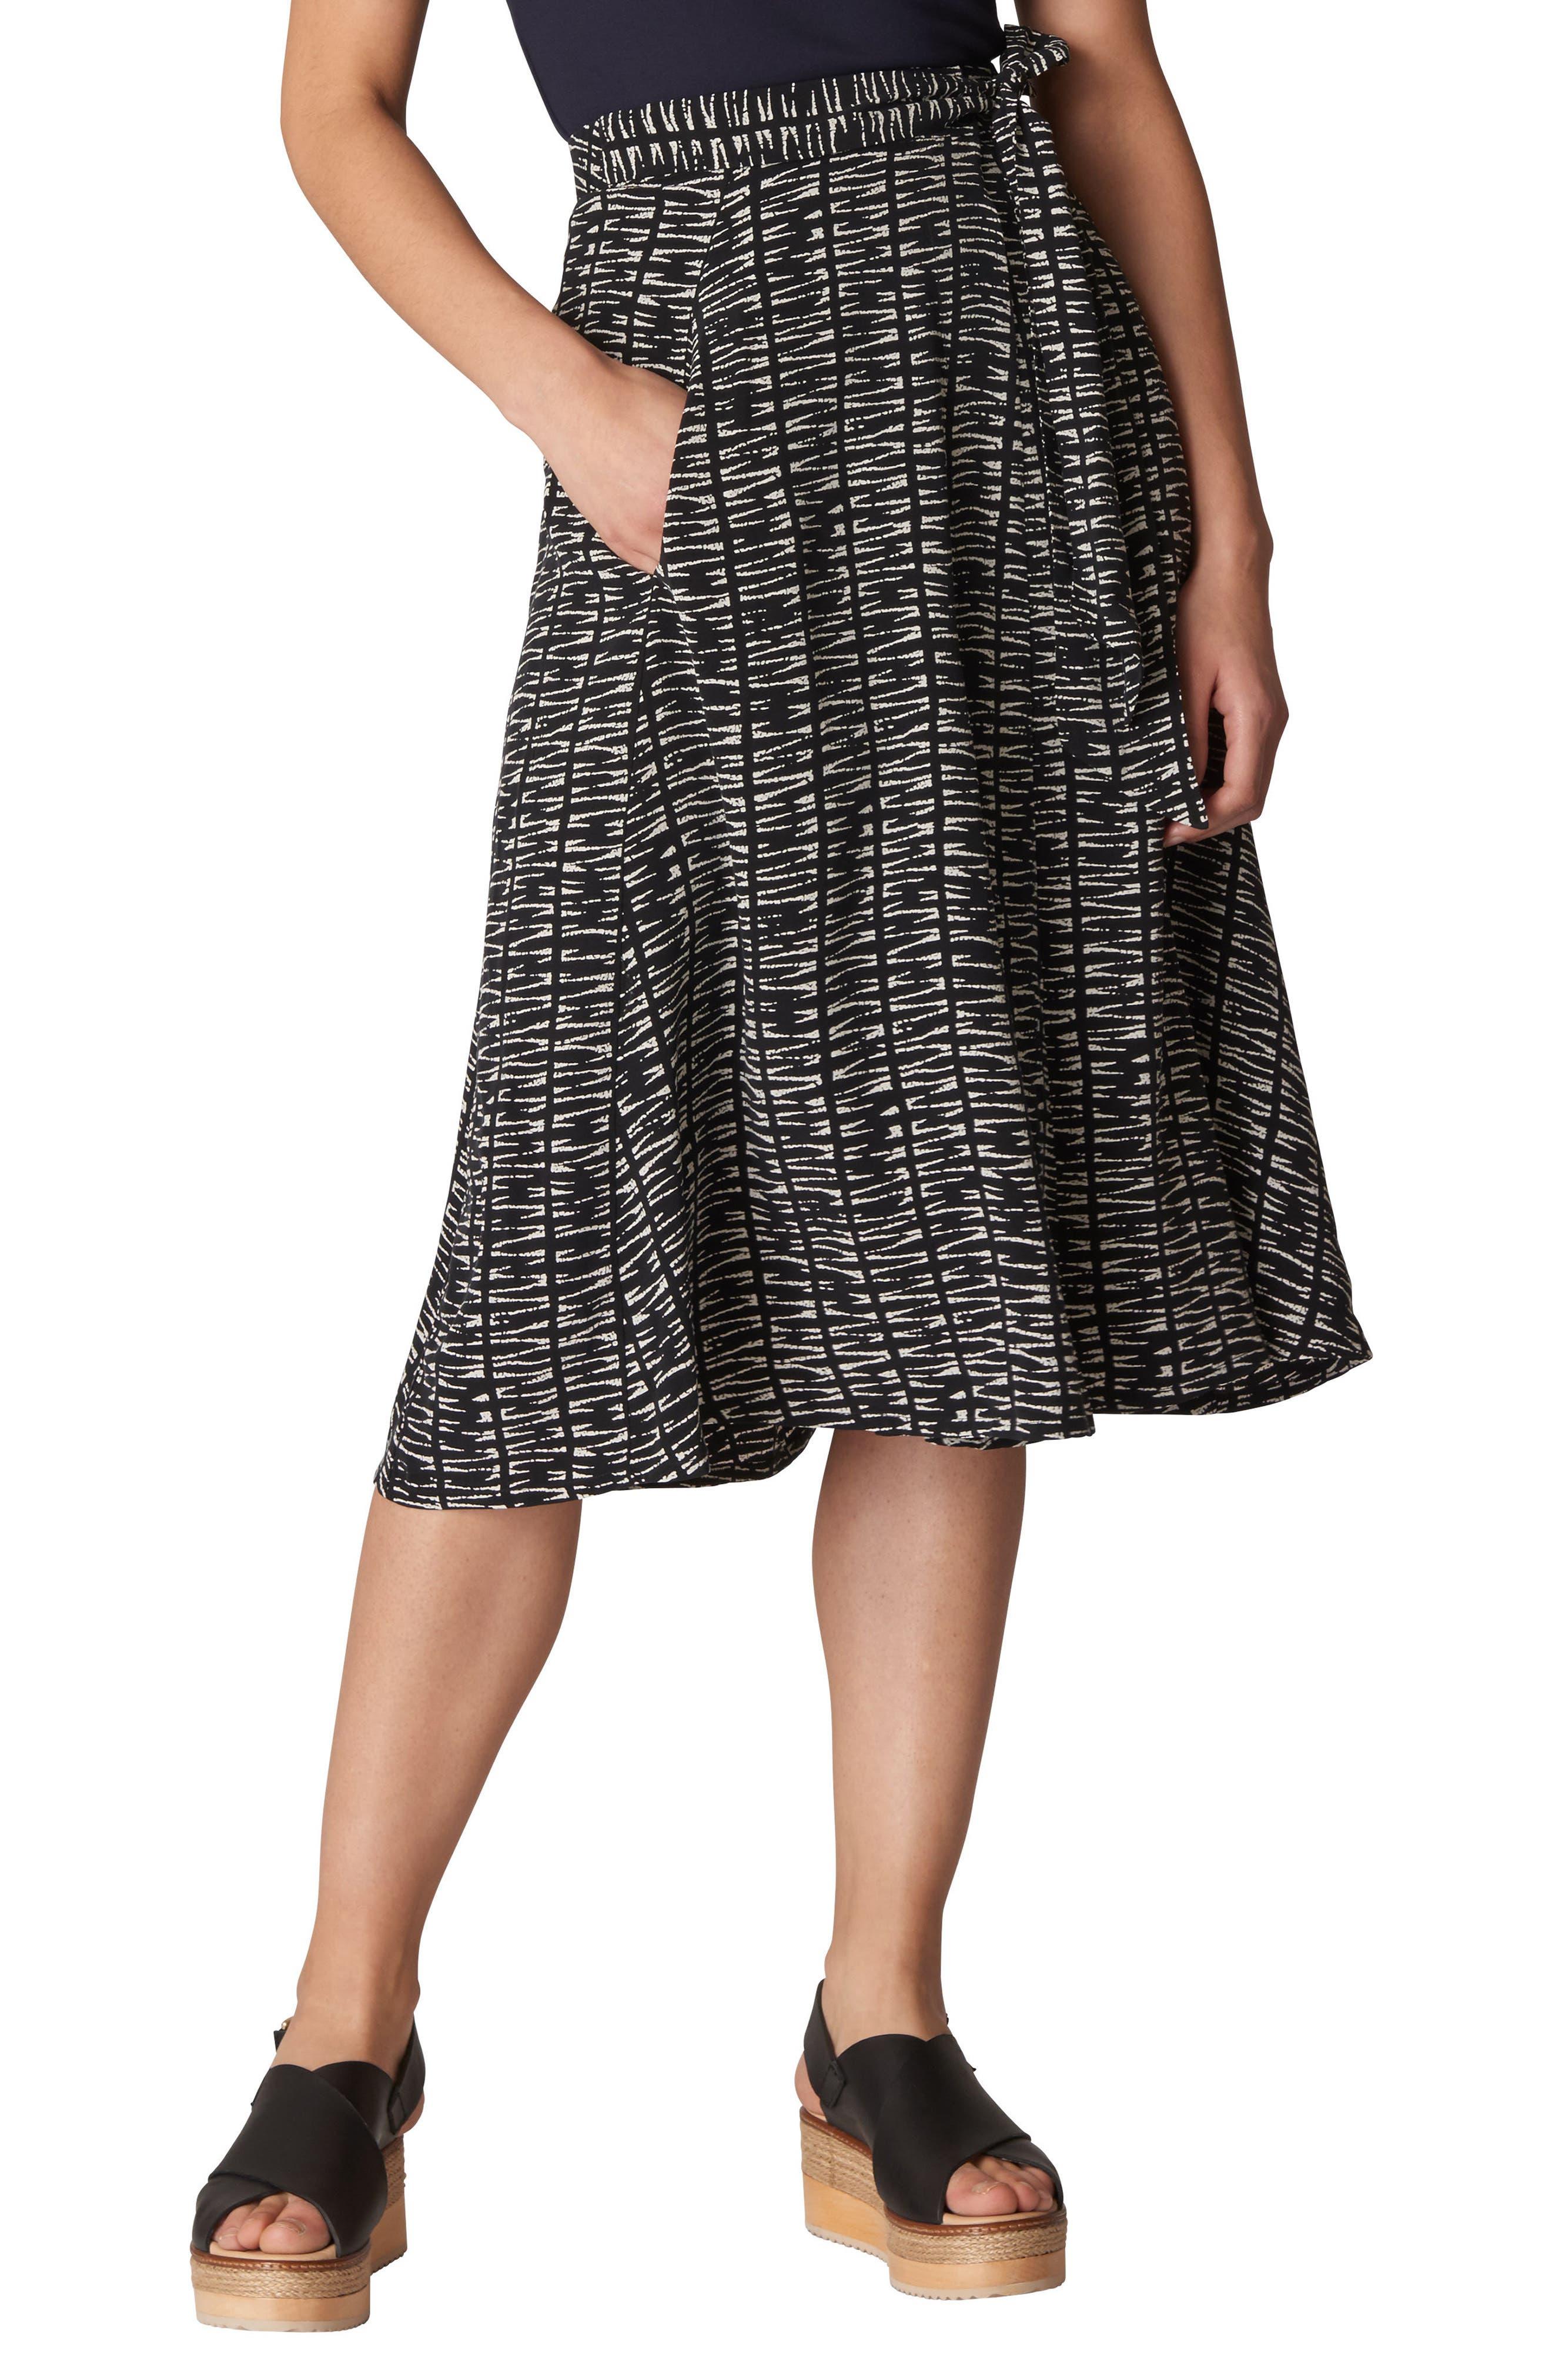 Avie Sahara Print Wrap Skirt,                         Main,                         color, Black/ Multi